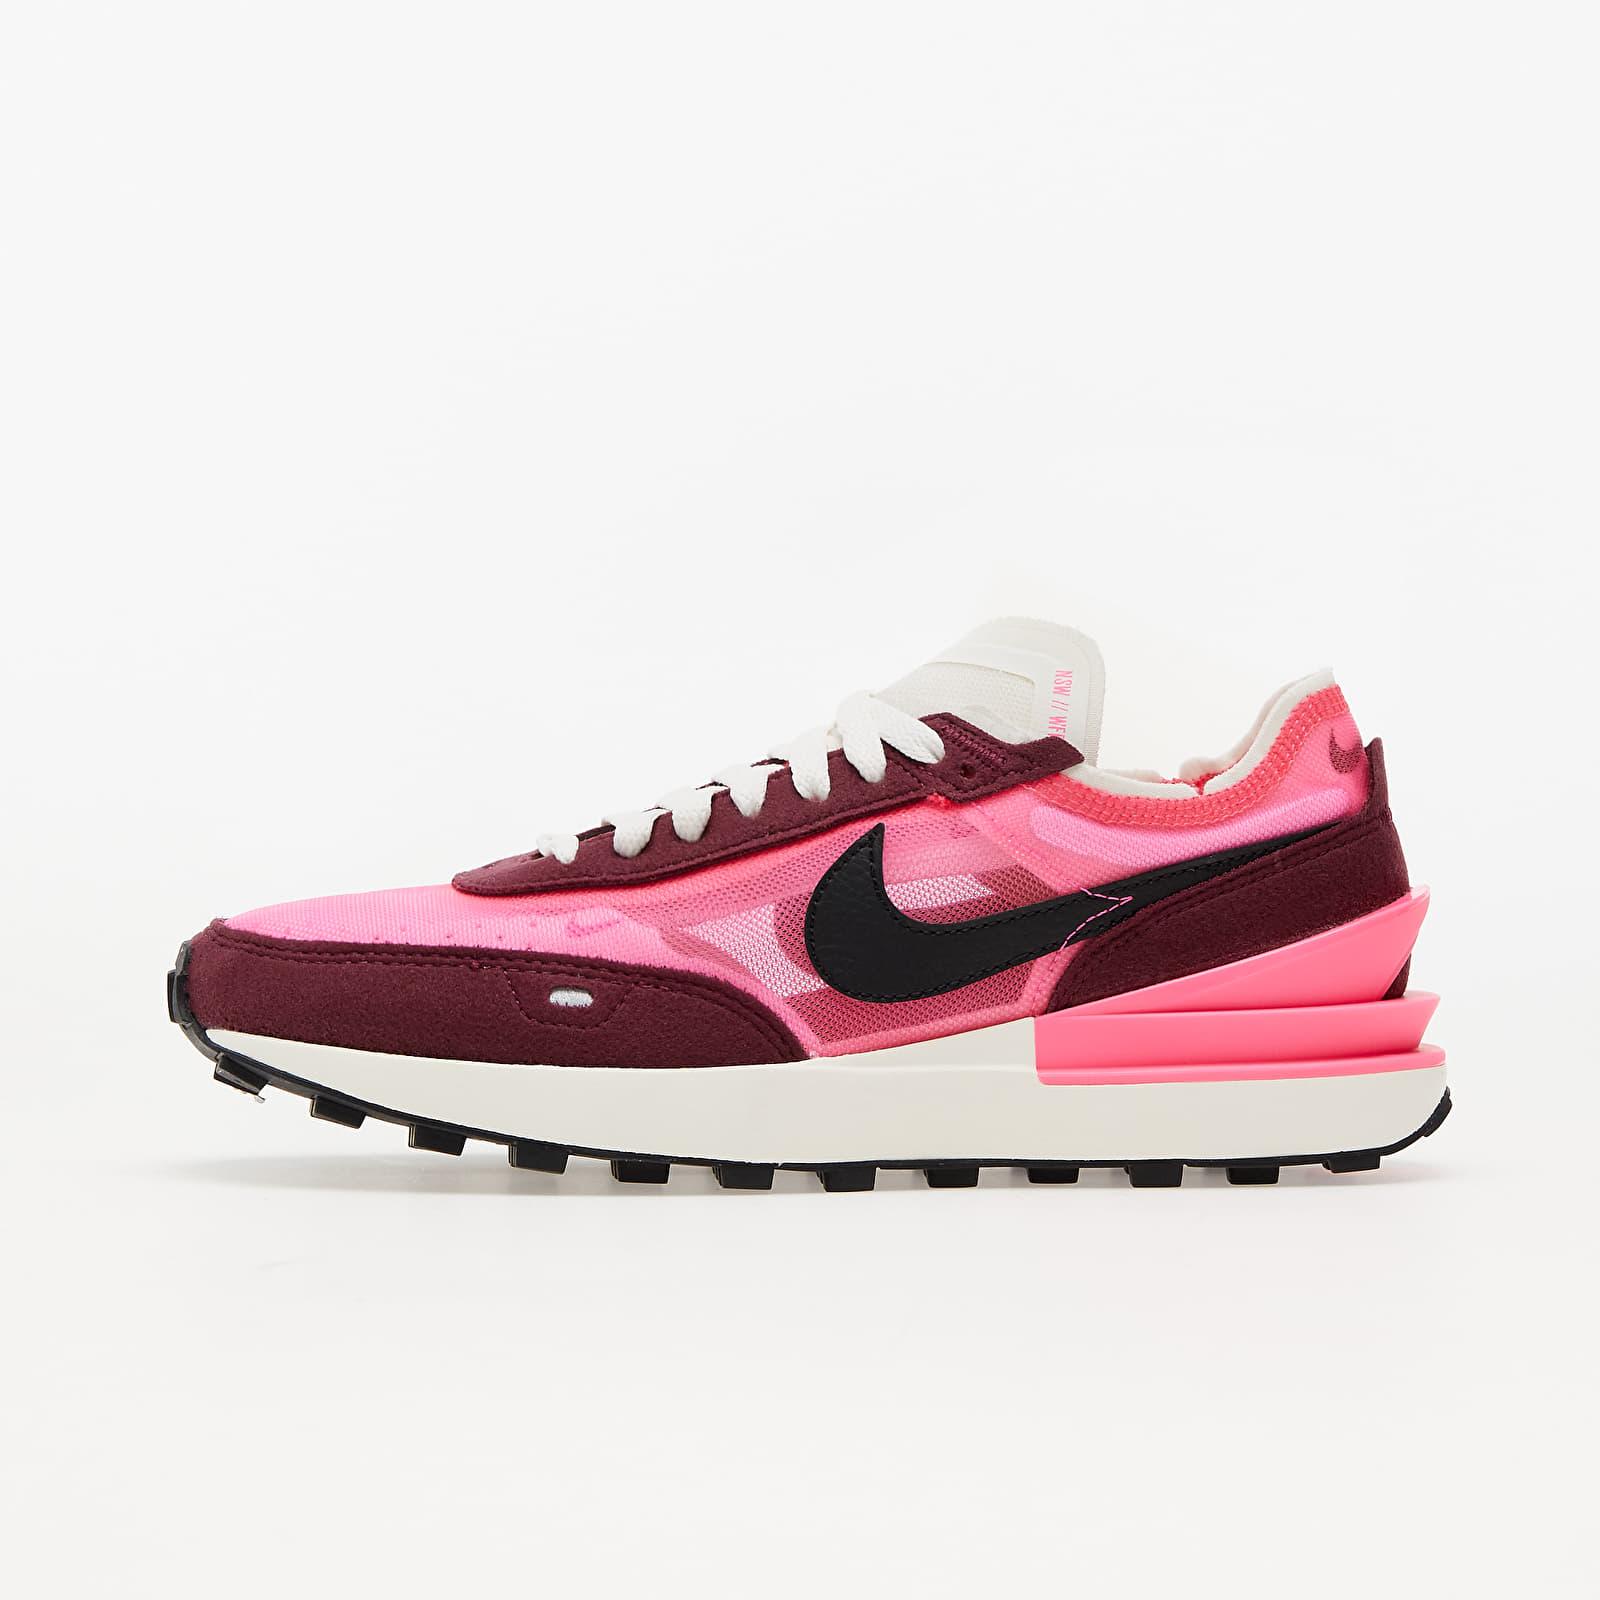 Nike W Waffle One Hyper Pink/ Black-Dark Beetroot-Sail EUR 38.5